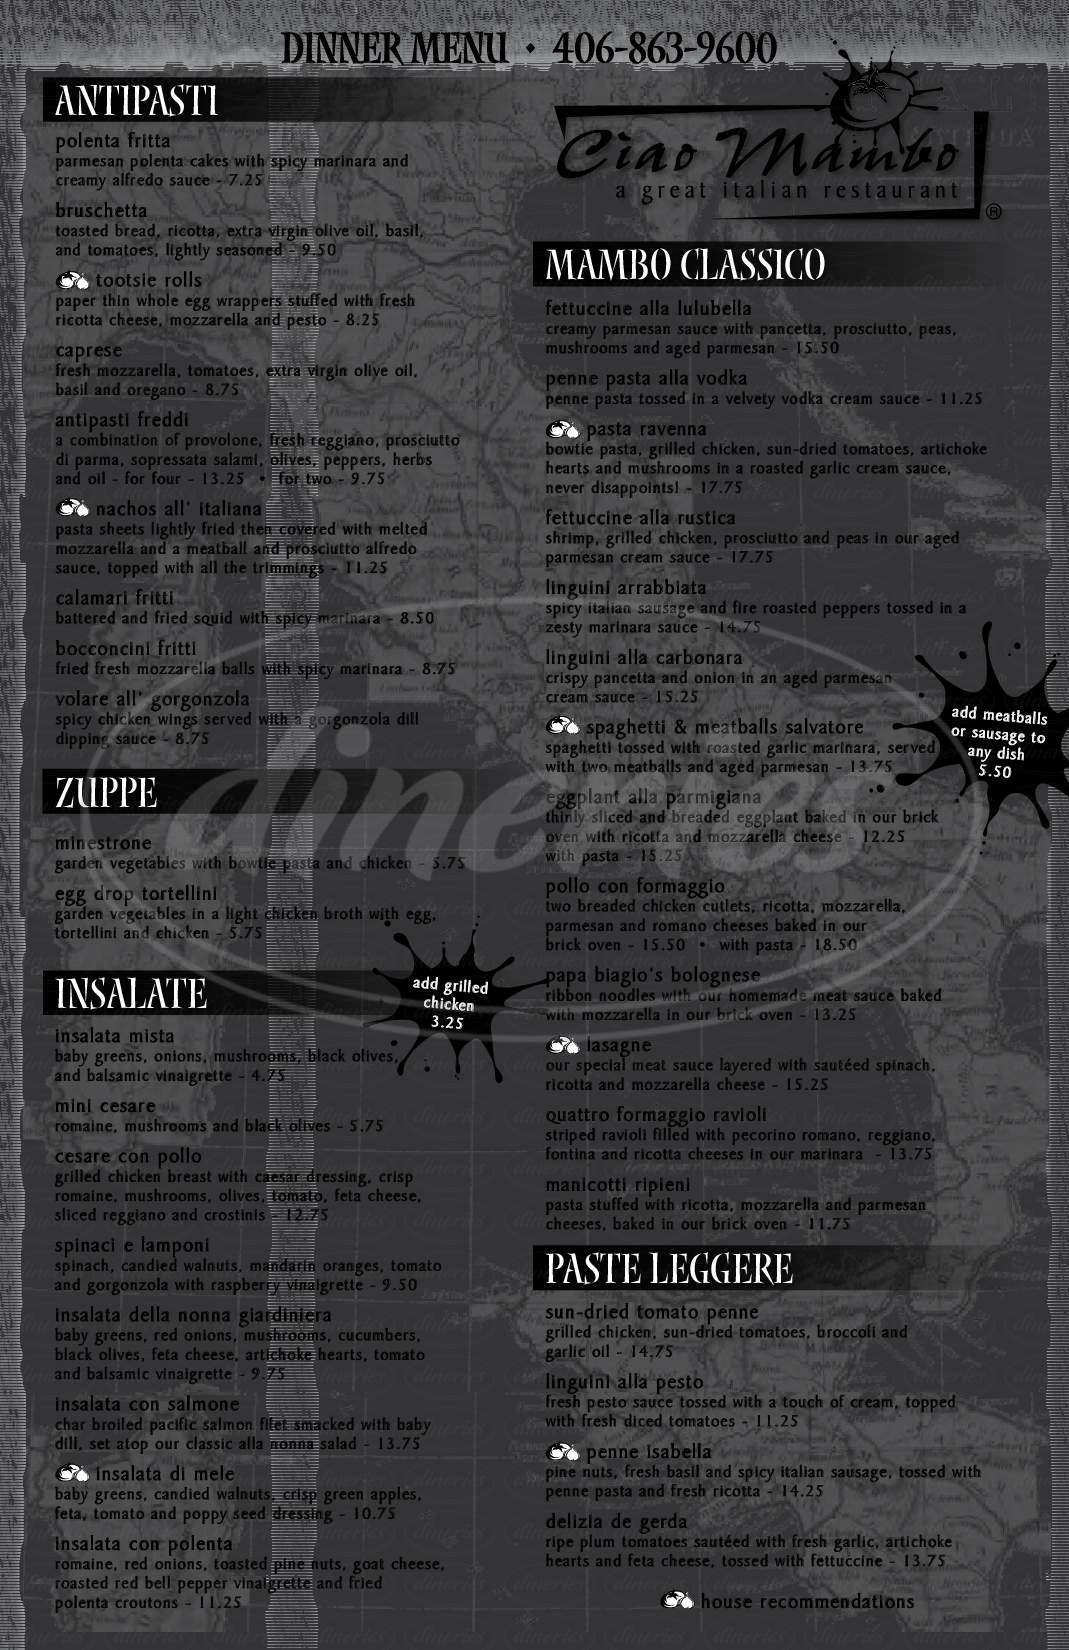 menu for Ciao Mambo